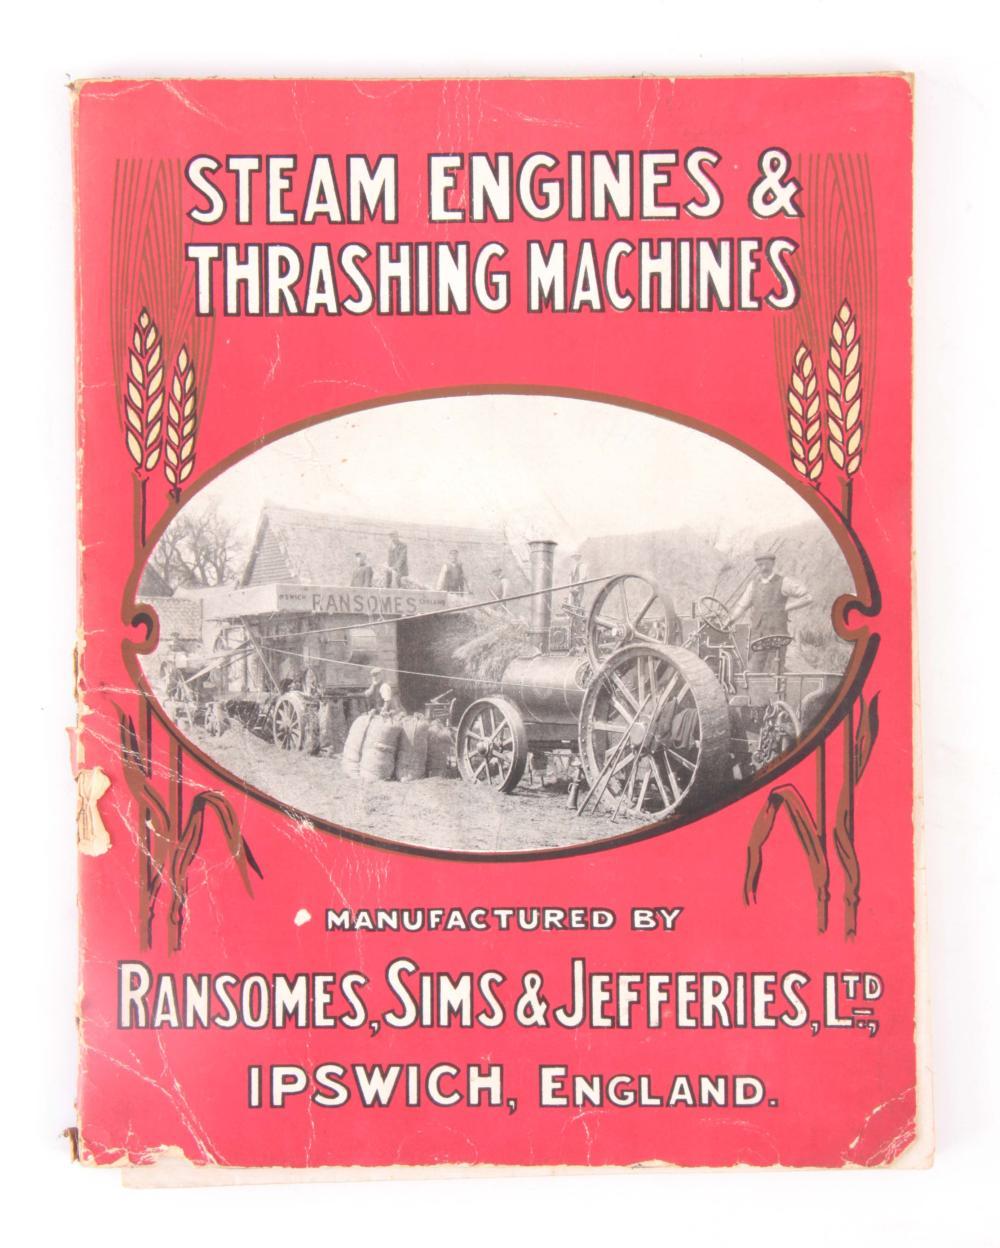 A RARE BOOK, STEAM ENGINES & THRASHING MACHINES by